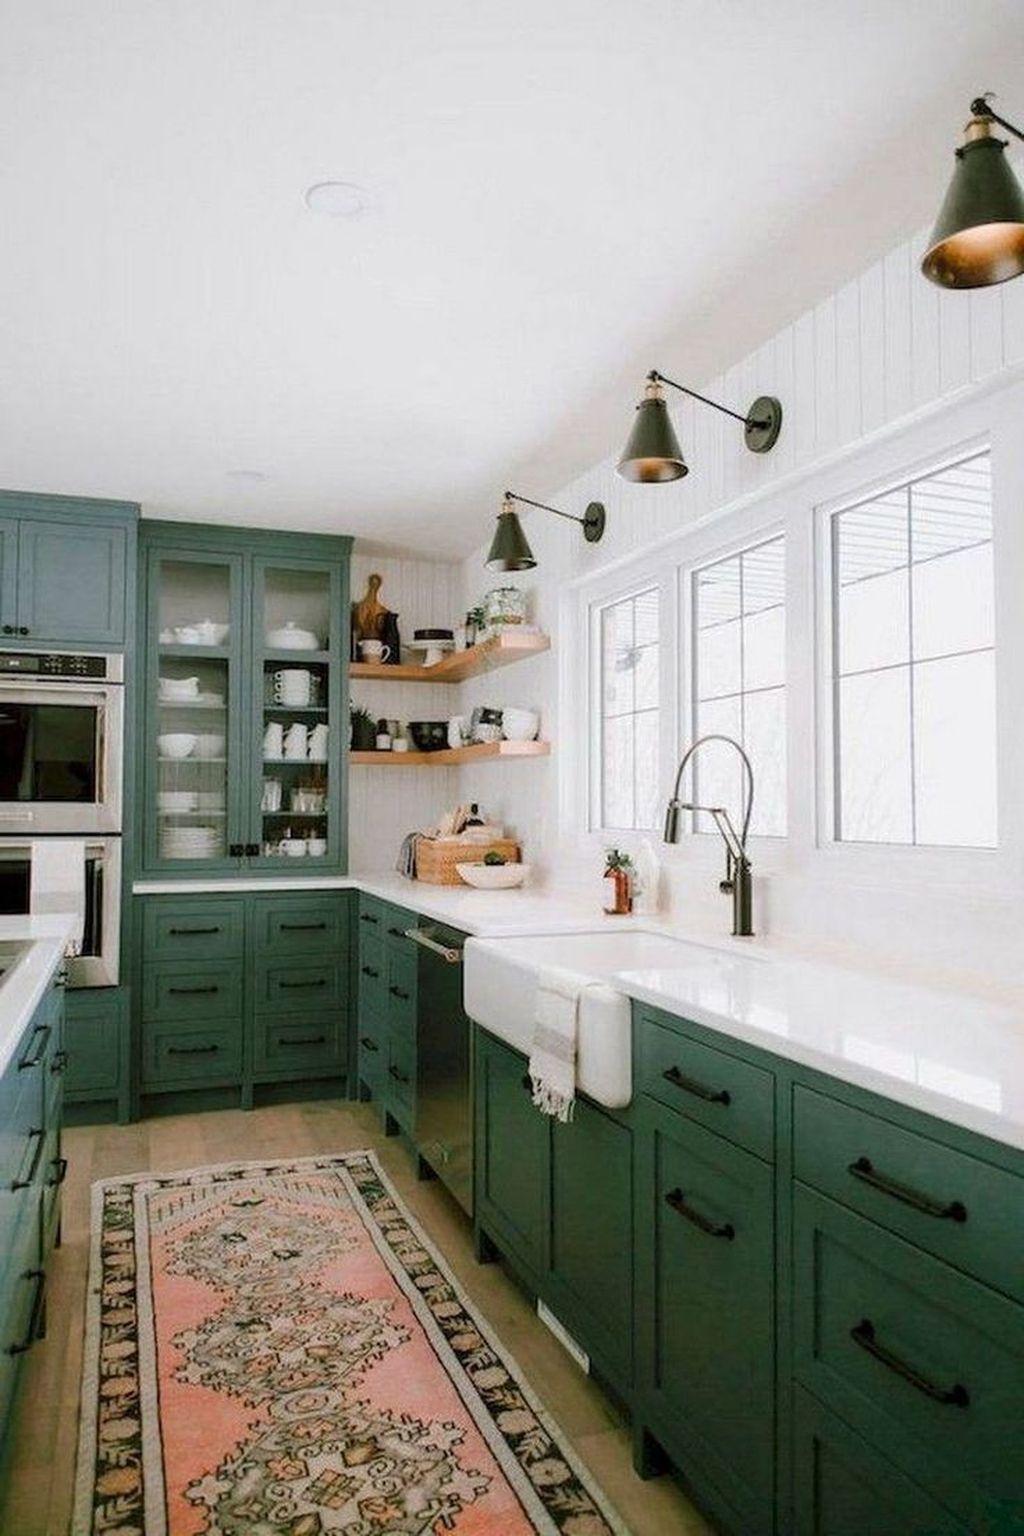 89 Diy Farmhouse Kitchen Cabinets Makeover Ideas Green Kitchen Designs Modern Farmhouse Kitchens Green Kitchen Cabinets